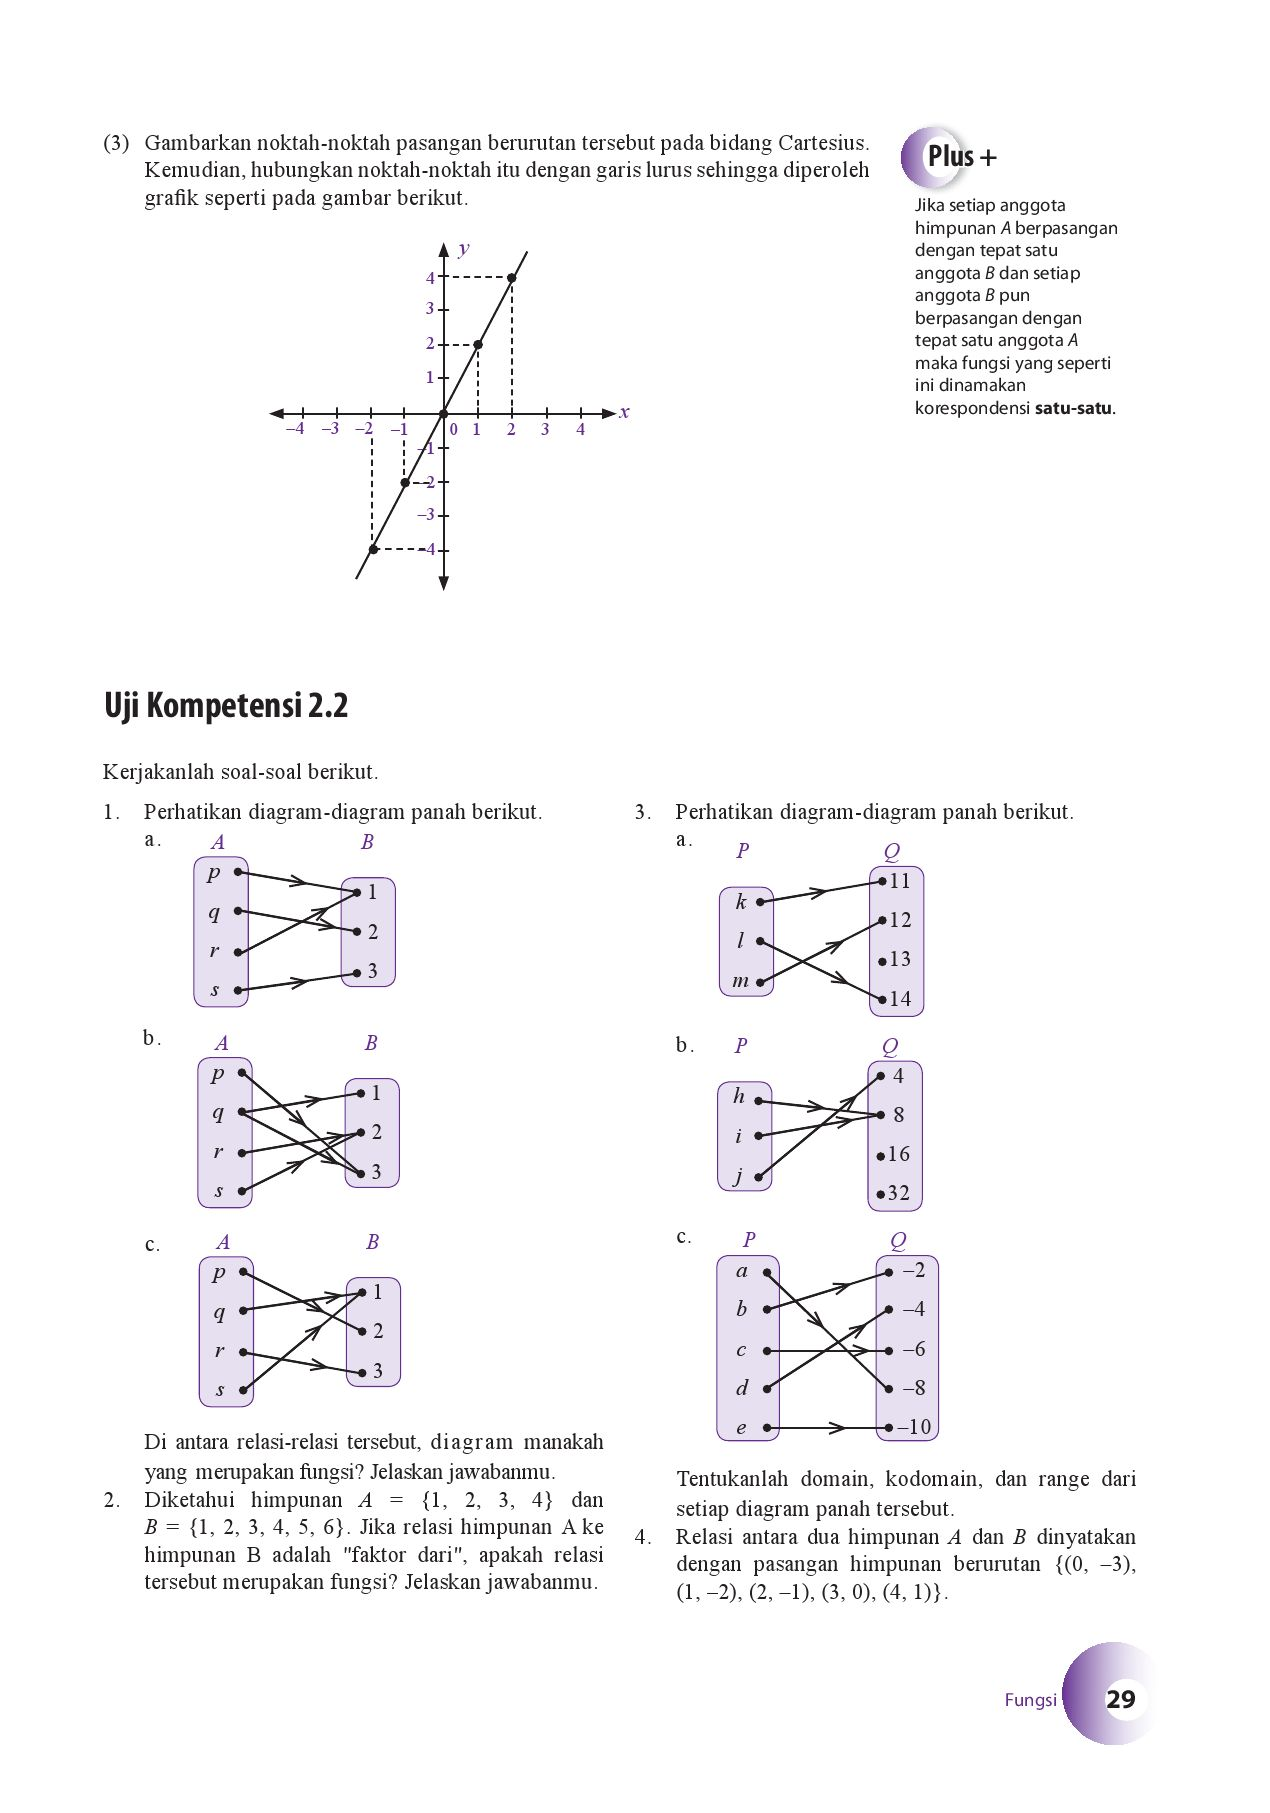 Kelas08mudah belajar matematikanuniek by s van selagan issuu ccuart Images